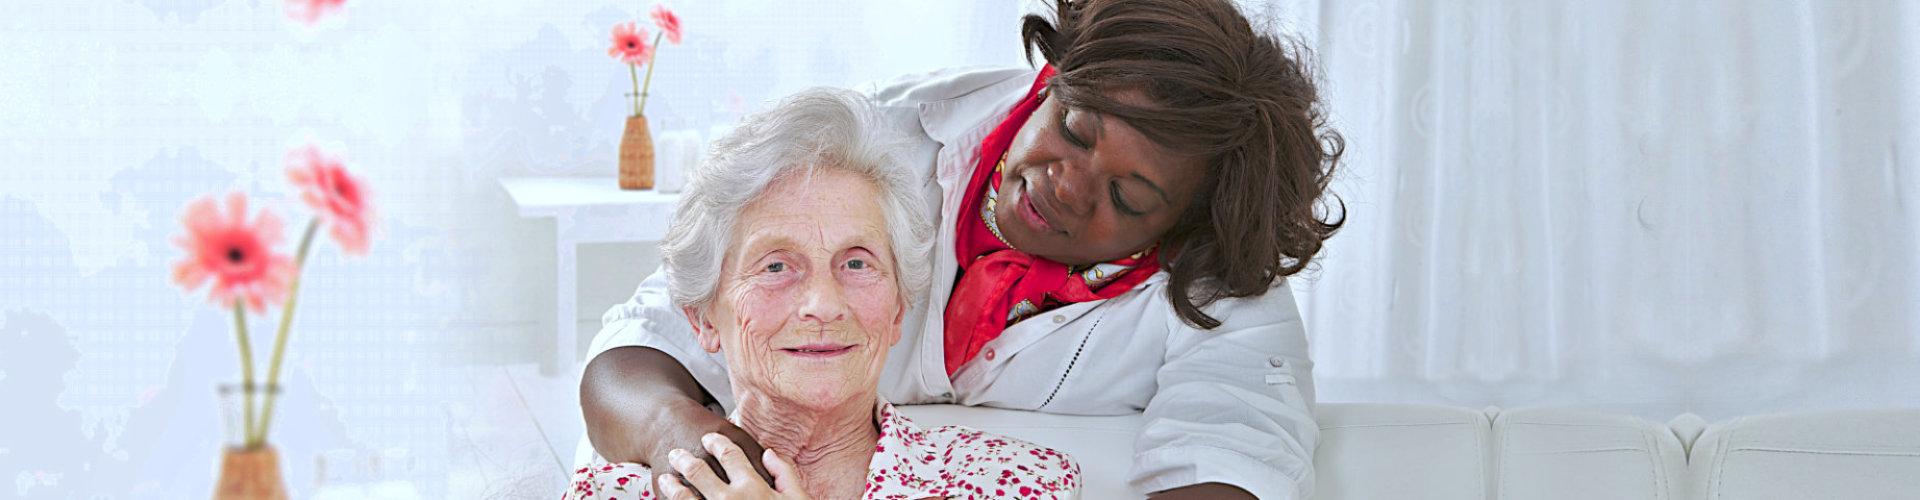 caregiver having a coversation to senior woman